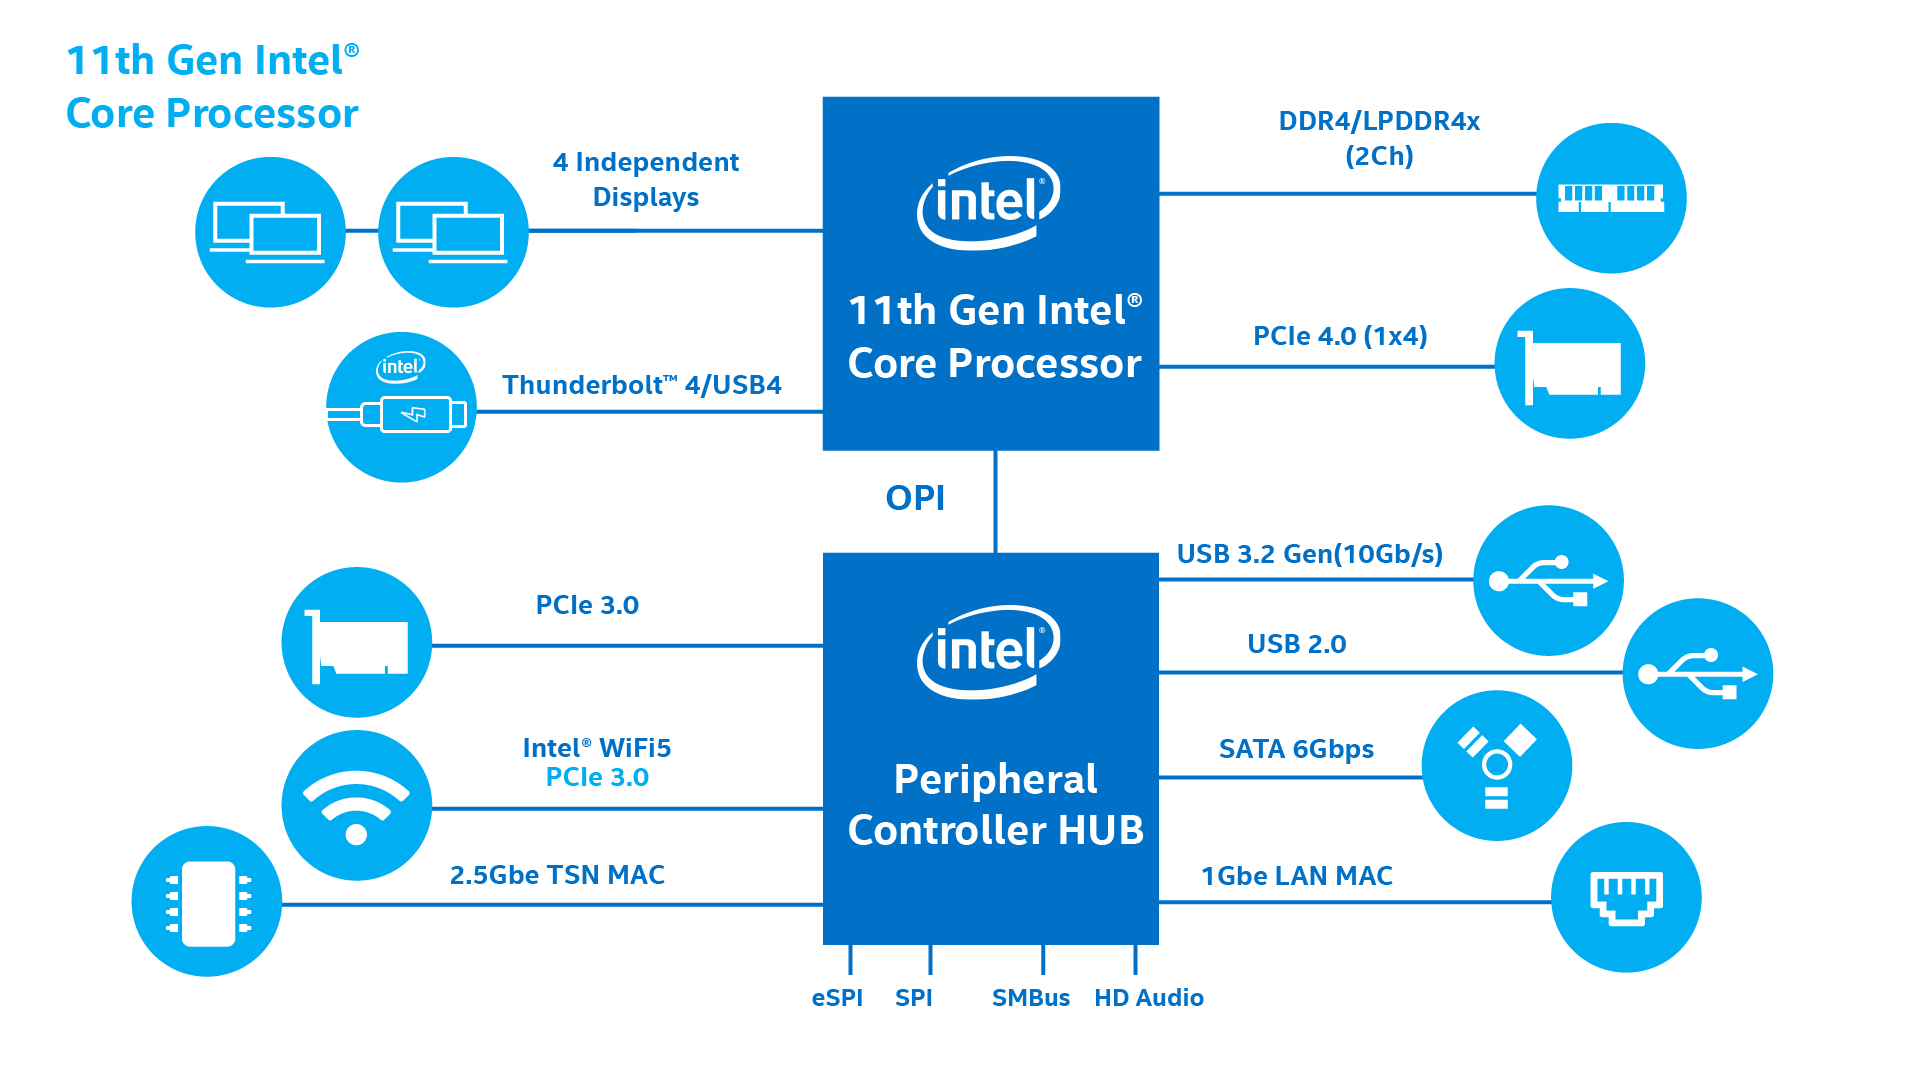 https://www.intel.co.jp/content/dam/www/program/design/us/en/images/16x9/11th-generation-core-processor.png